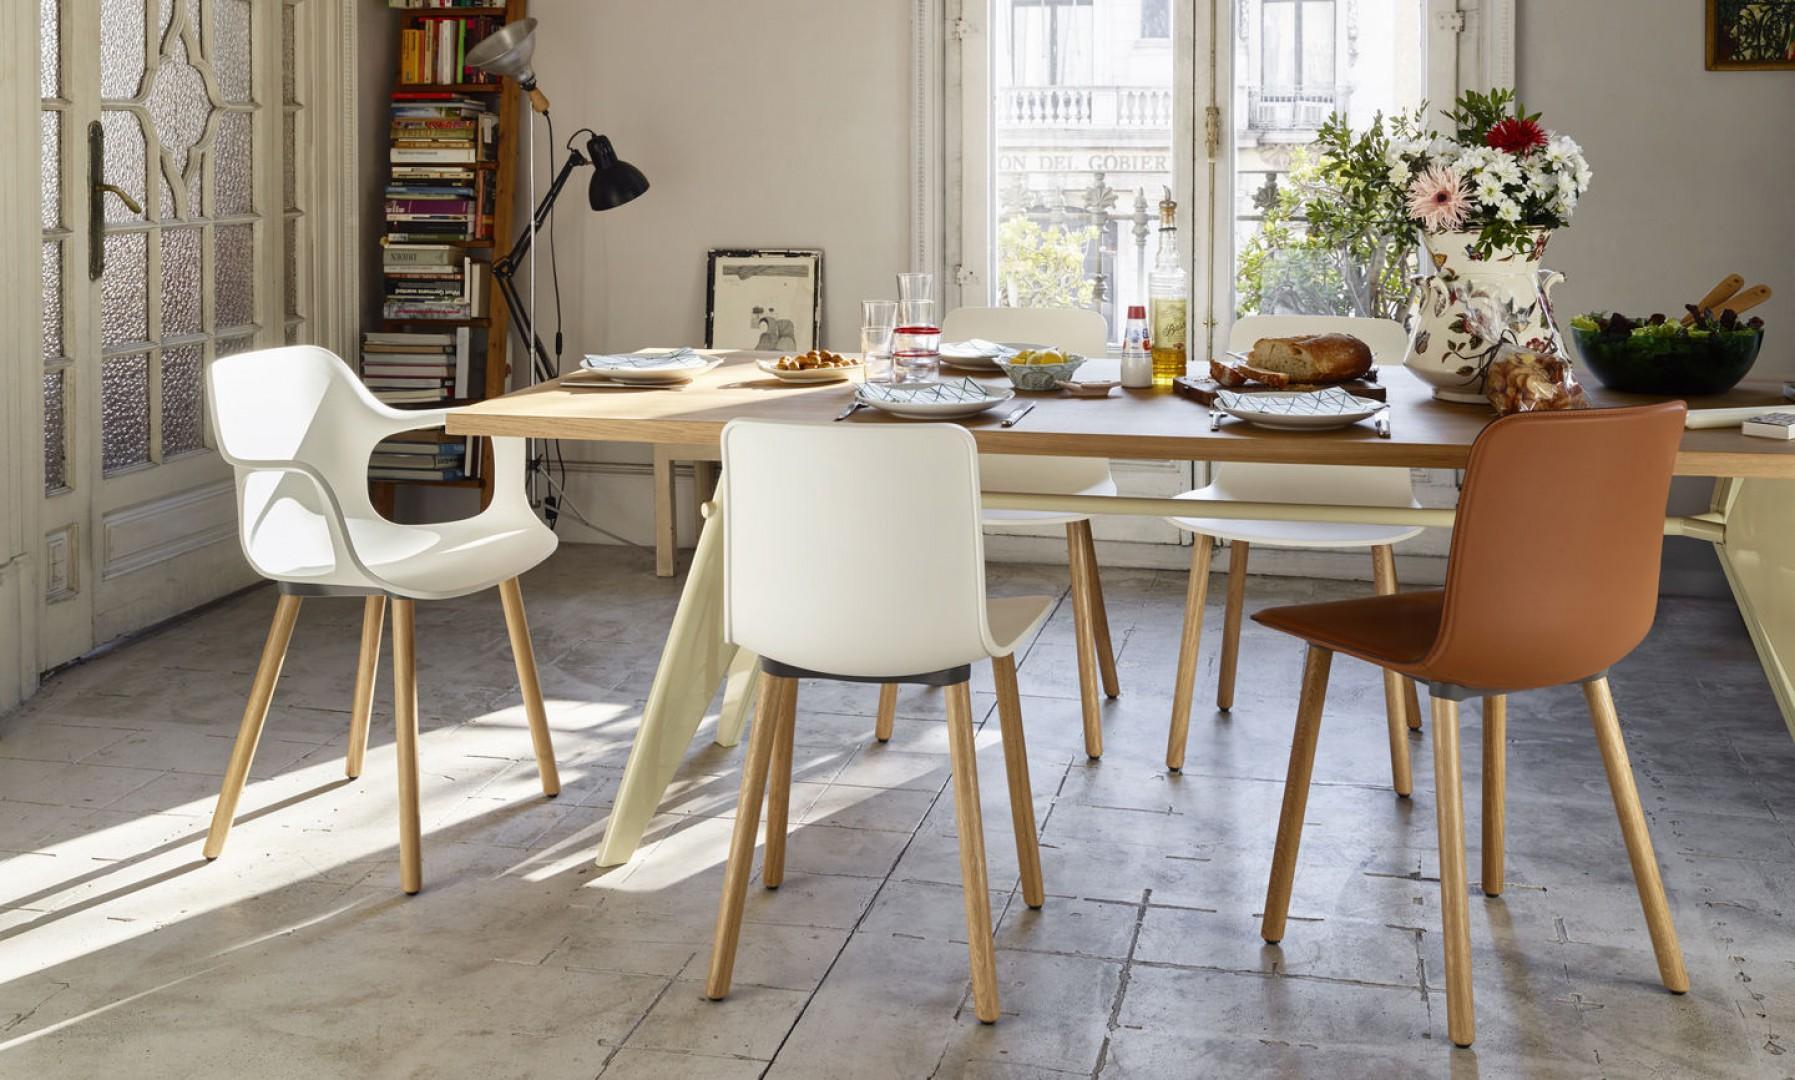 Krzesła z serii Hal firmy Vitra. Projekt: Jasper Morrison. Fot. Vitra